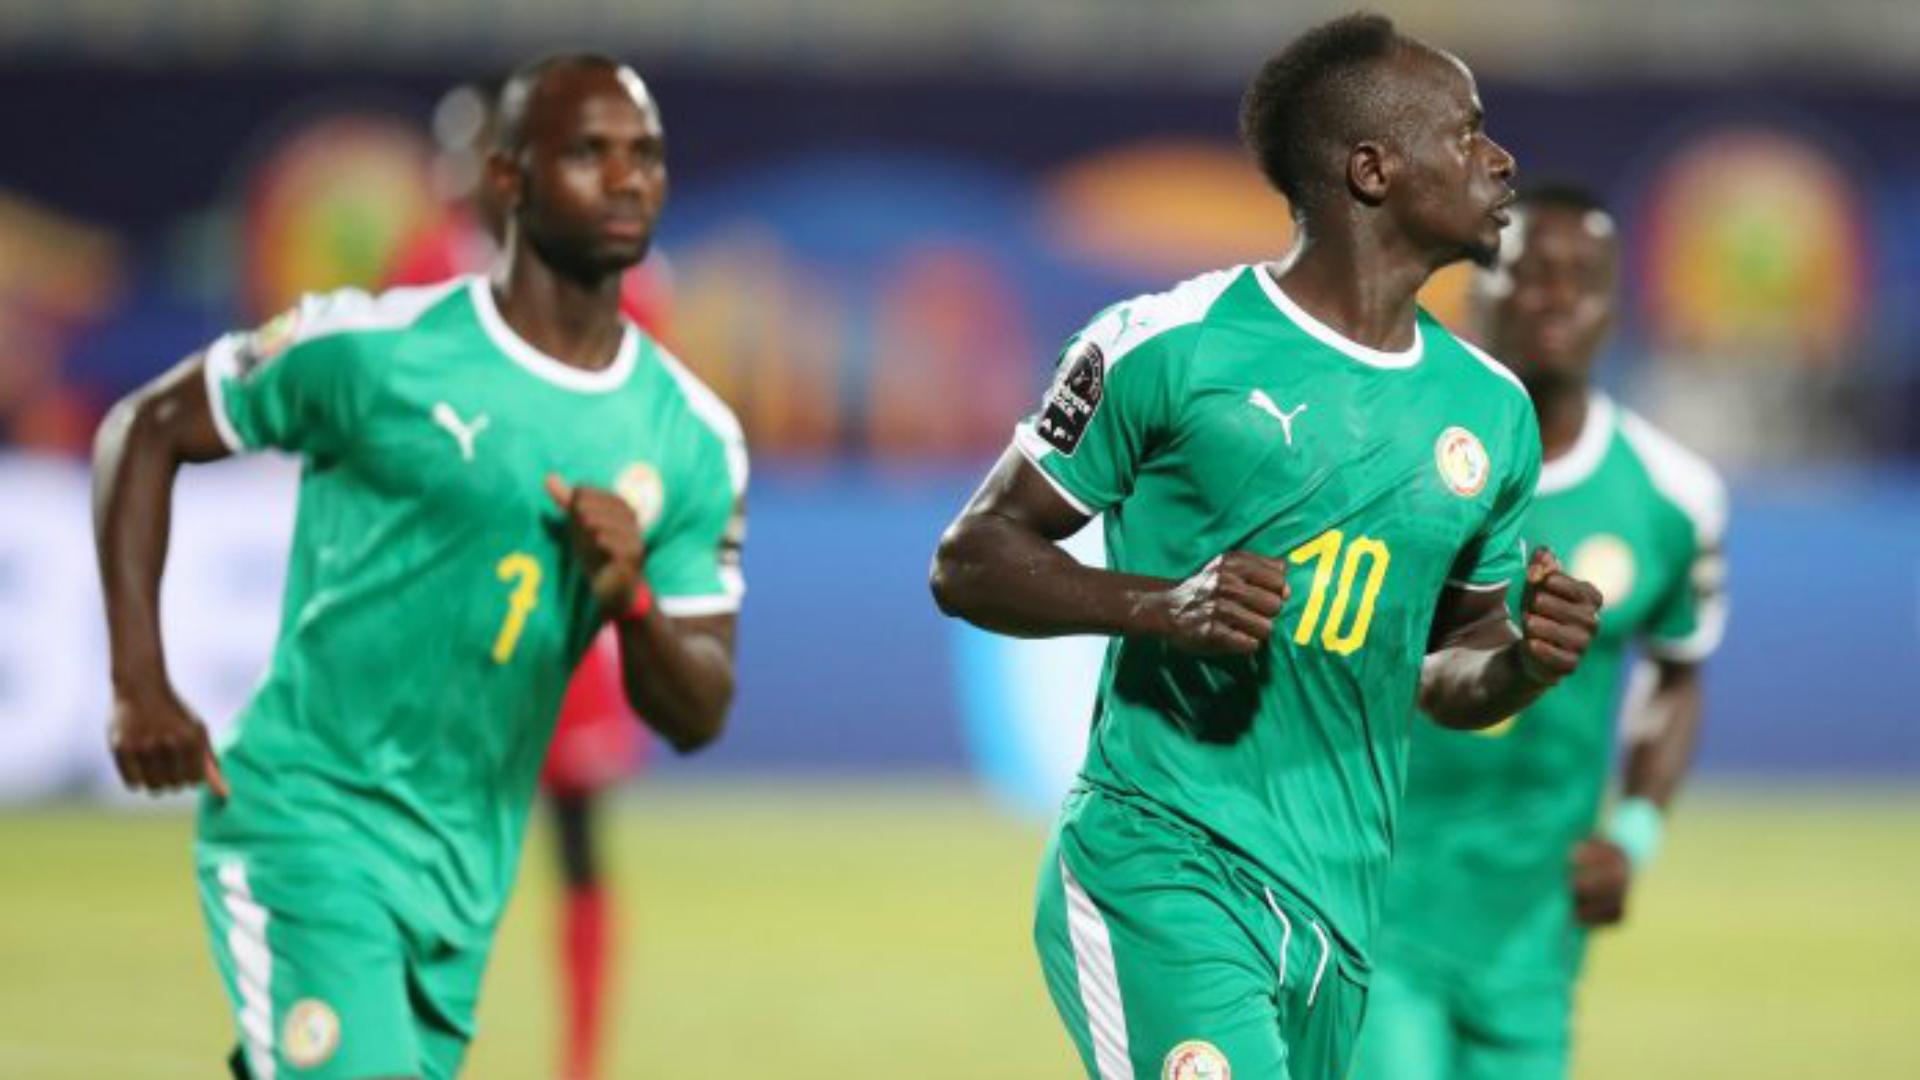 Afcon 2019 Live Blog: Senegal and Algeria battle for gold in Egypt